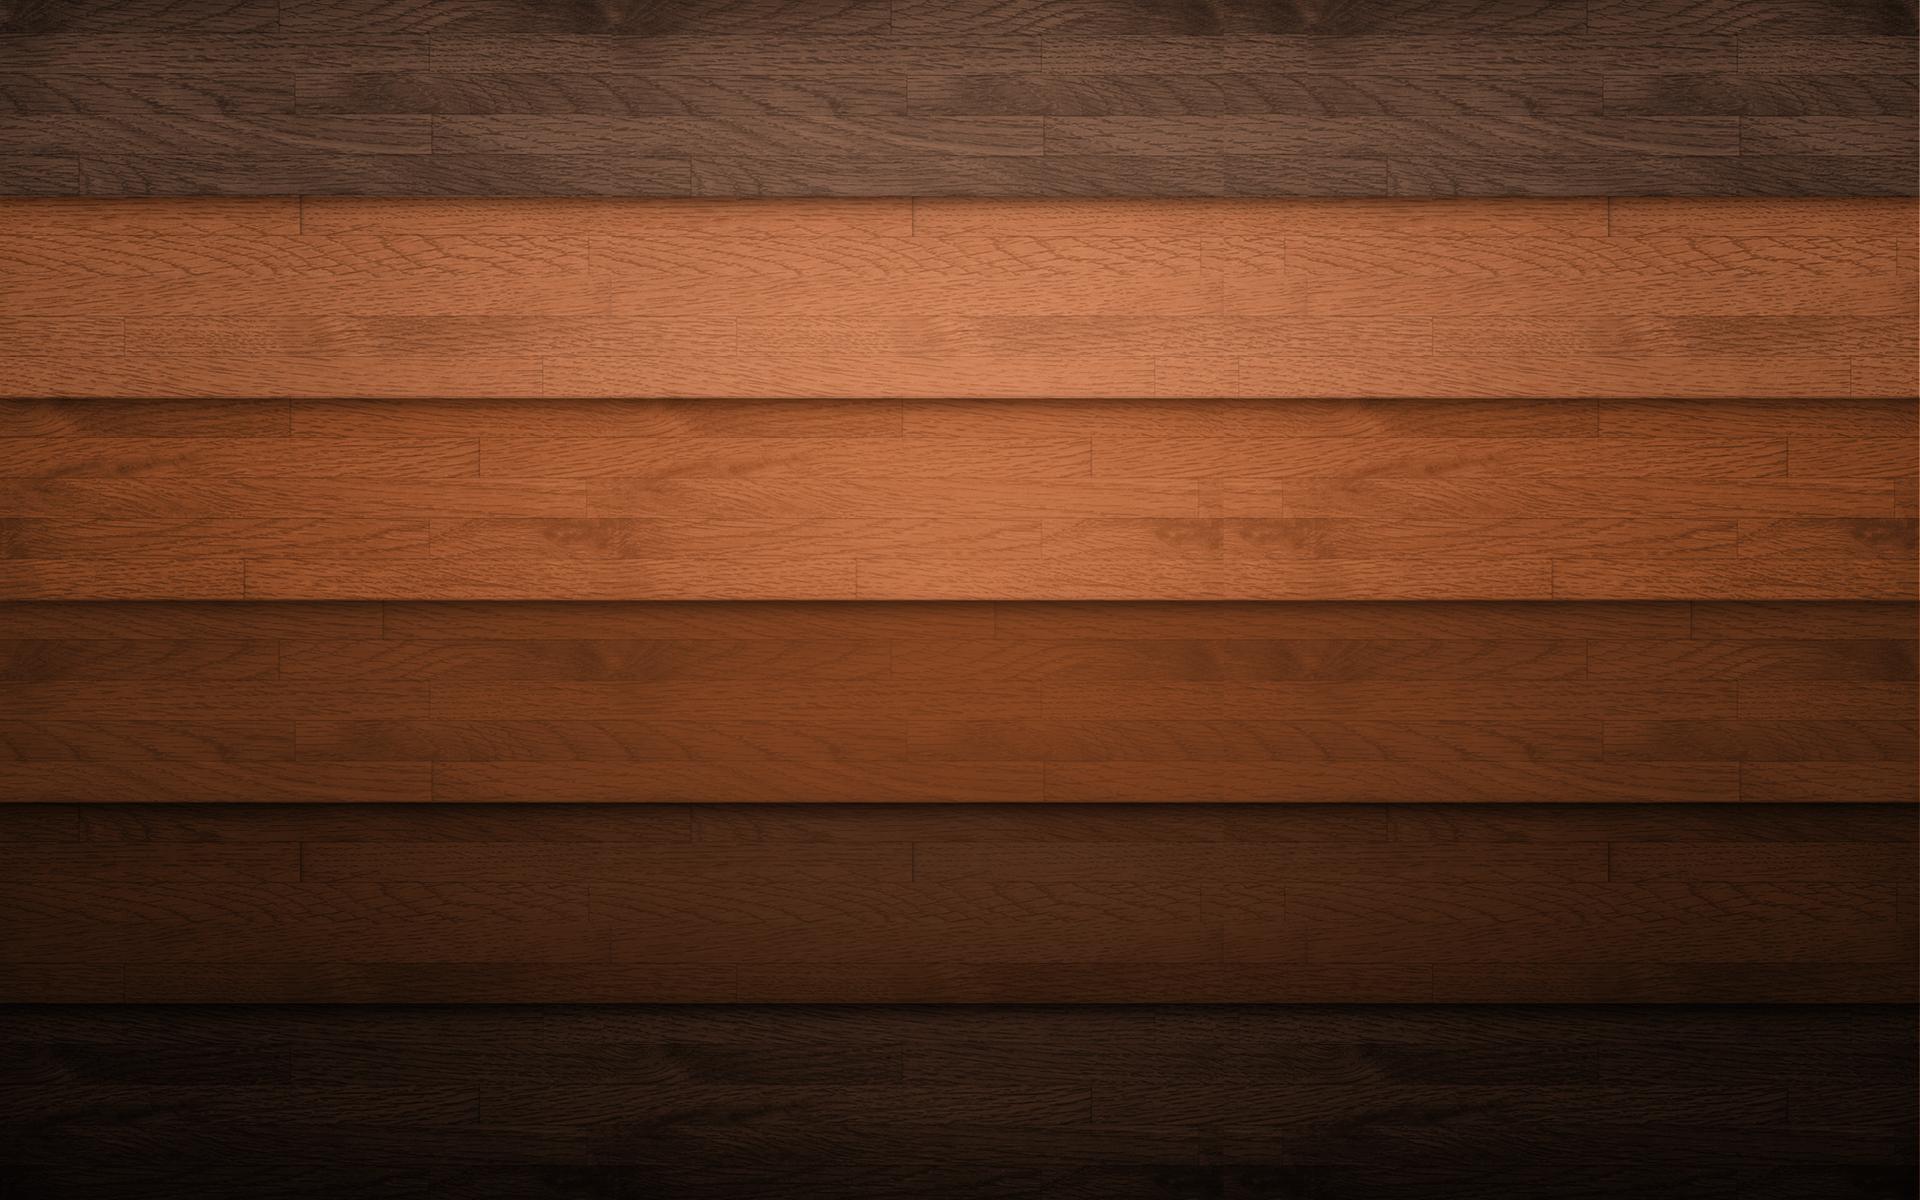 Wood Plank wallpaper 226156 1920x1200